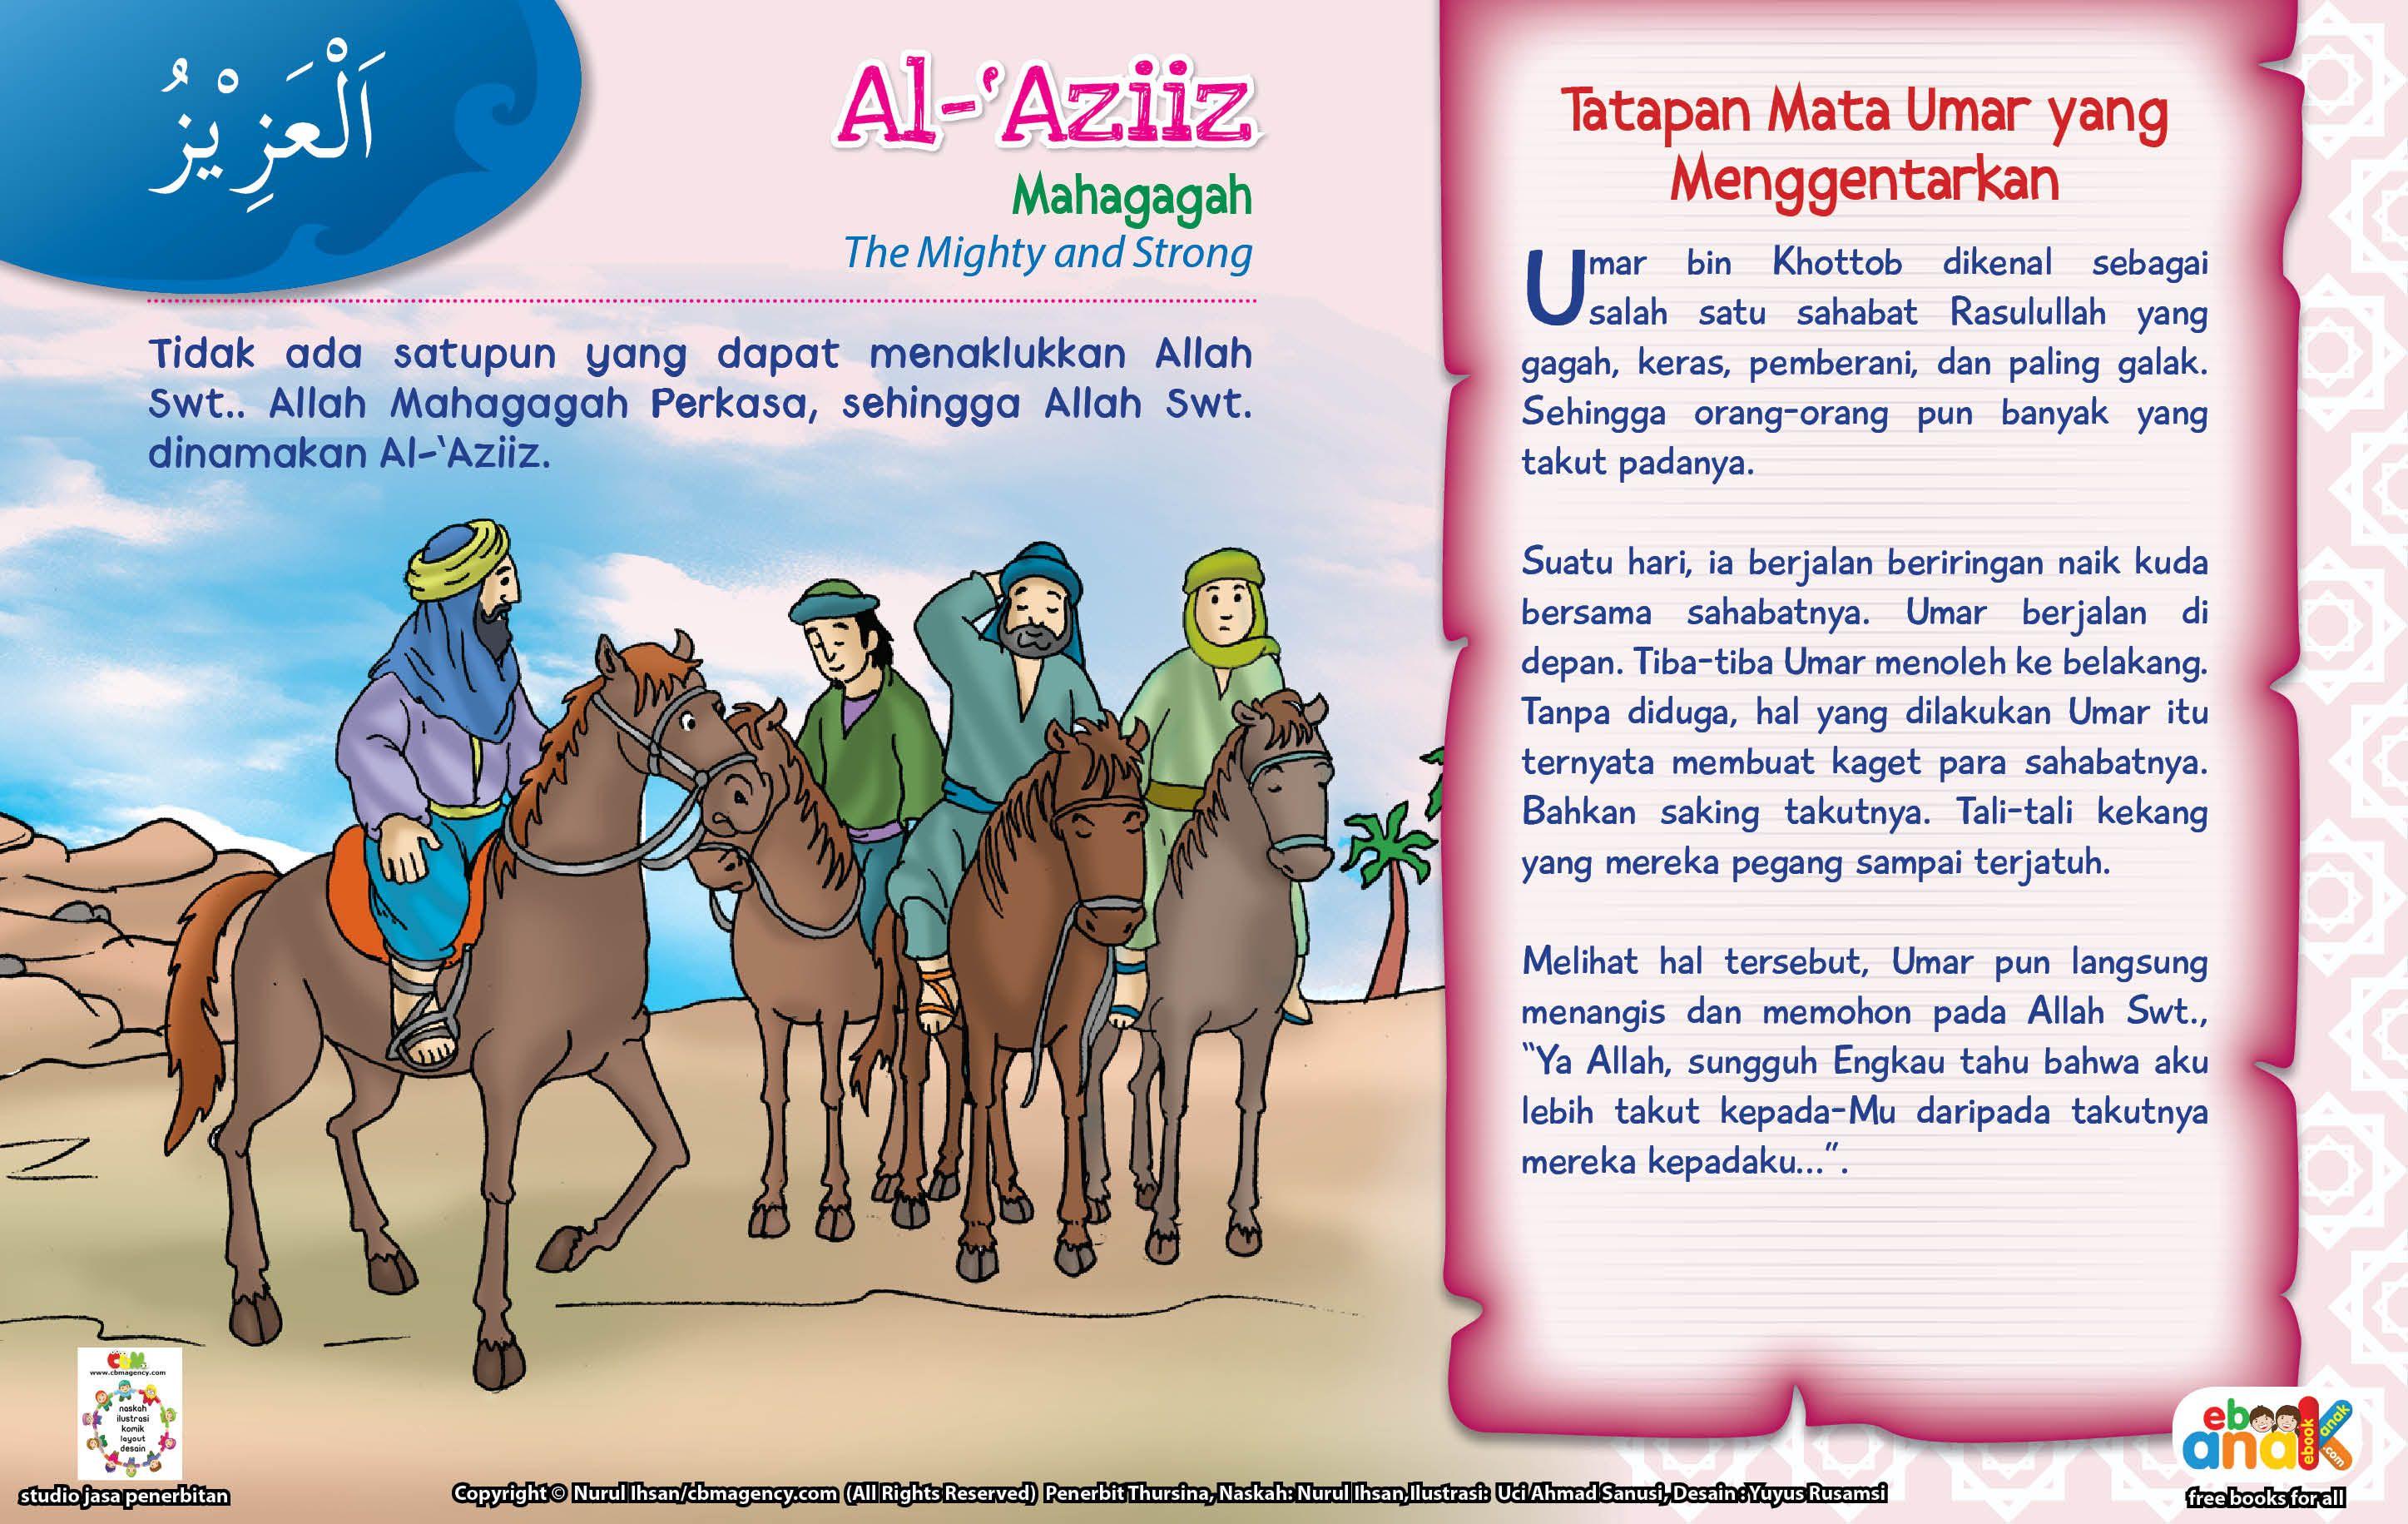 Kisah Asma'ul Husna Al'Aziiz Ilmi Islam, Muslim, dan